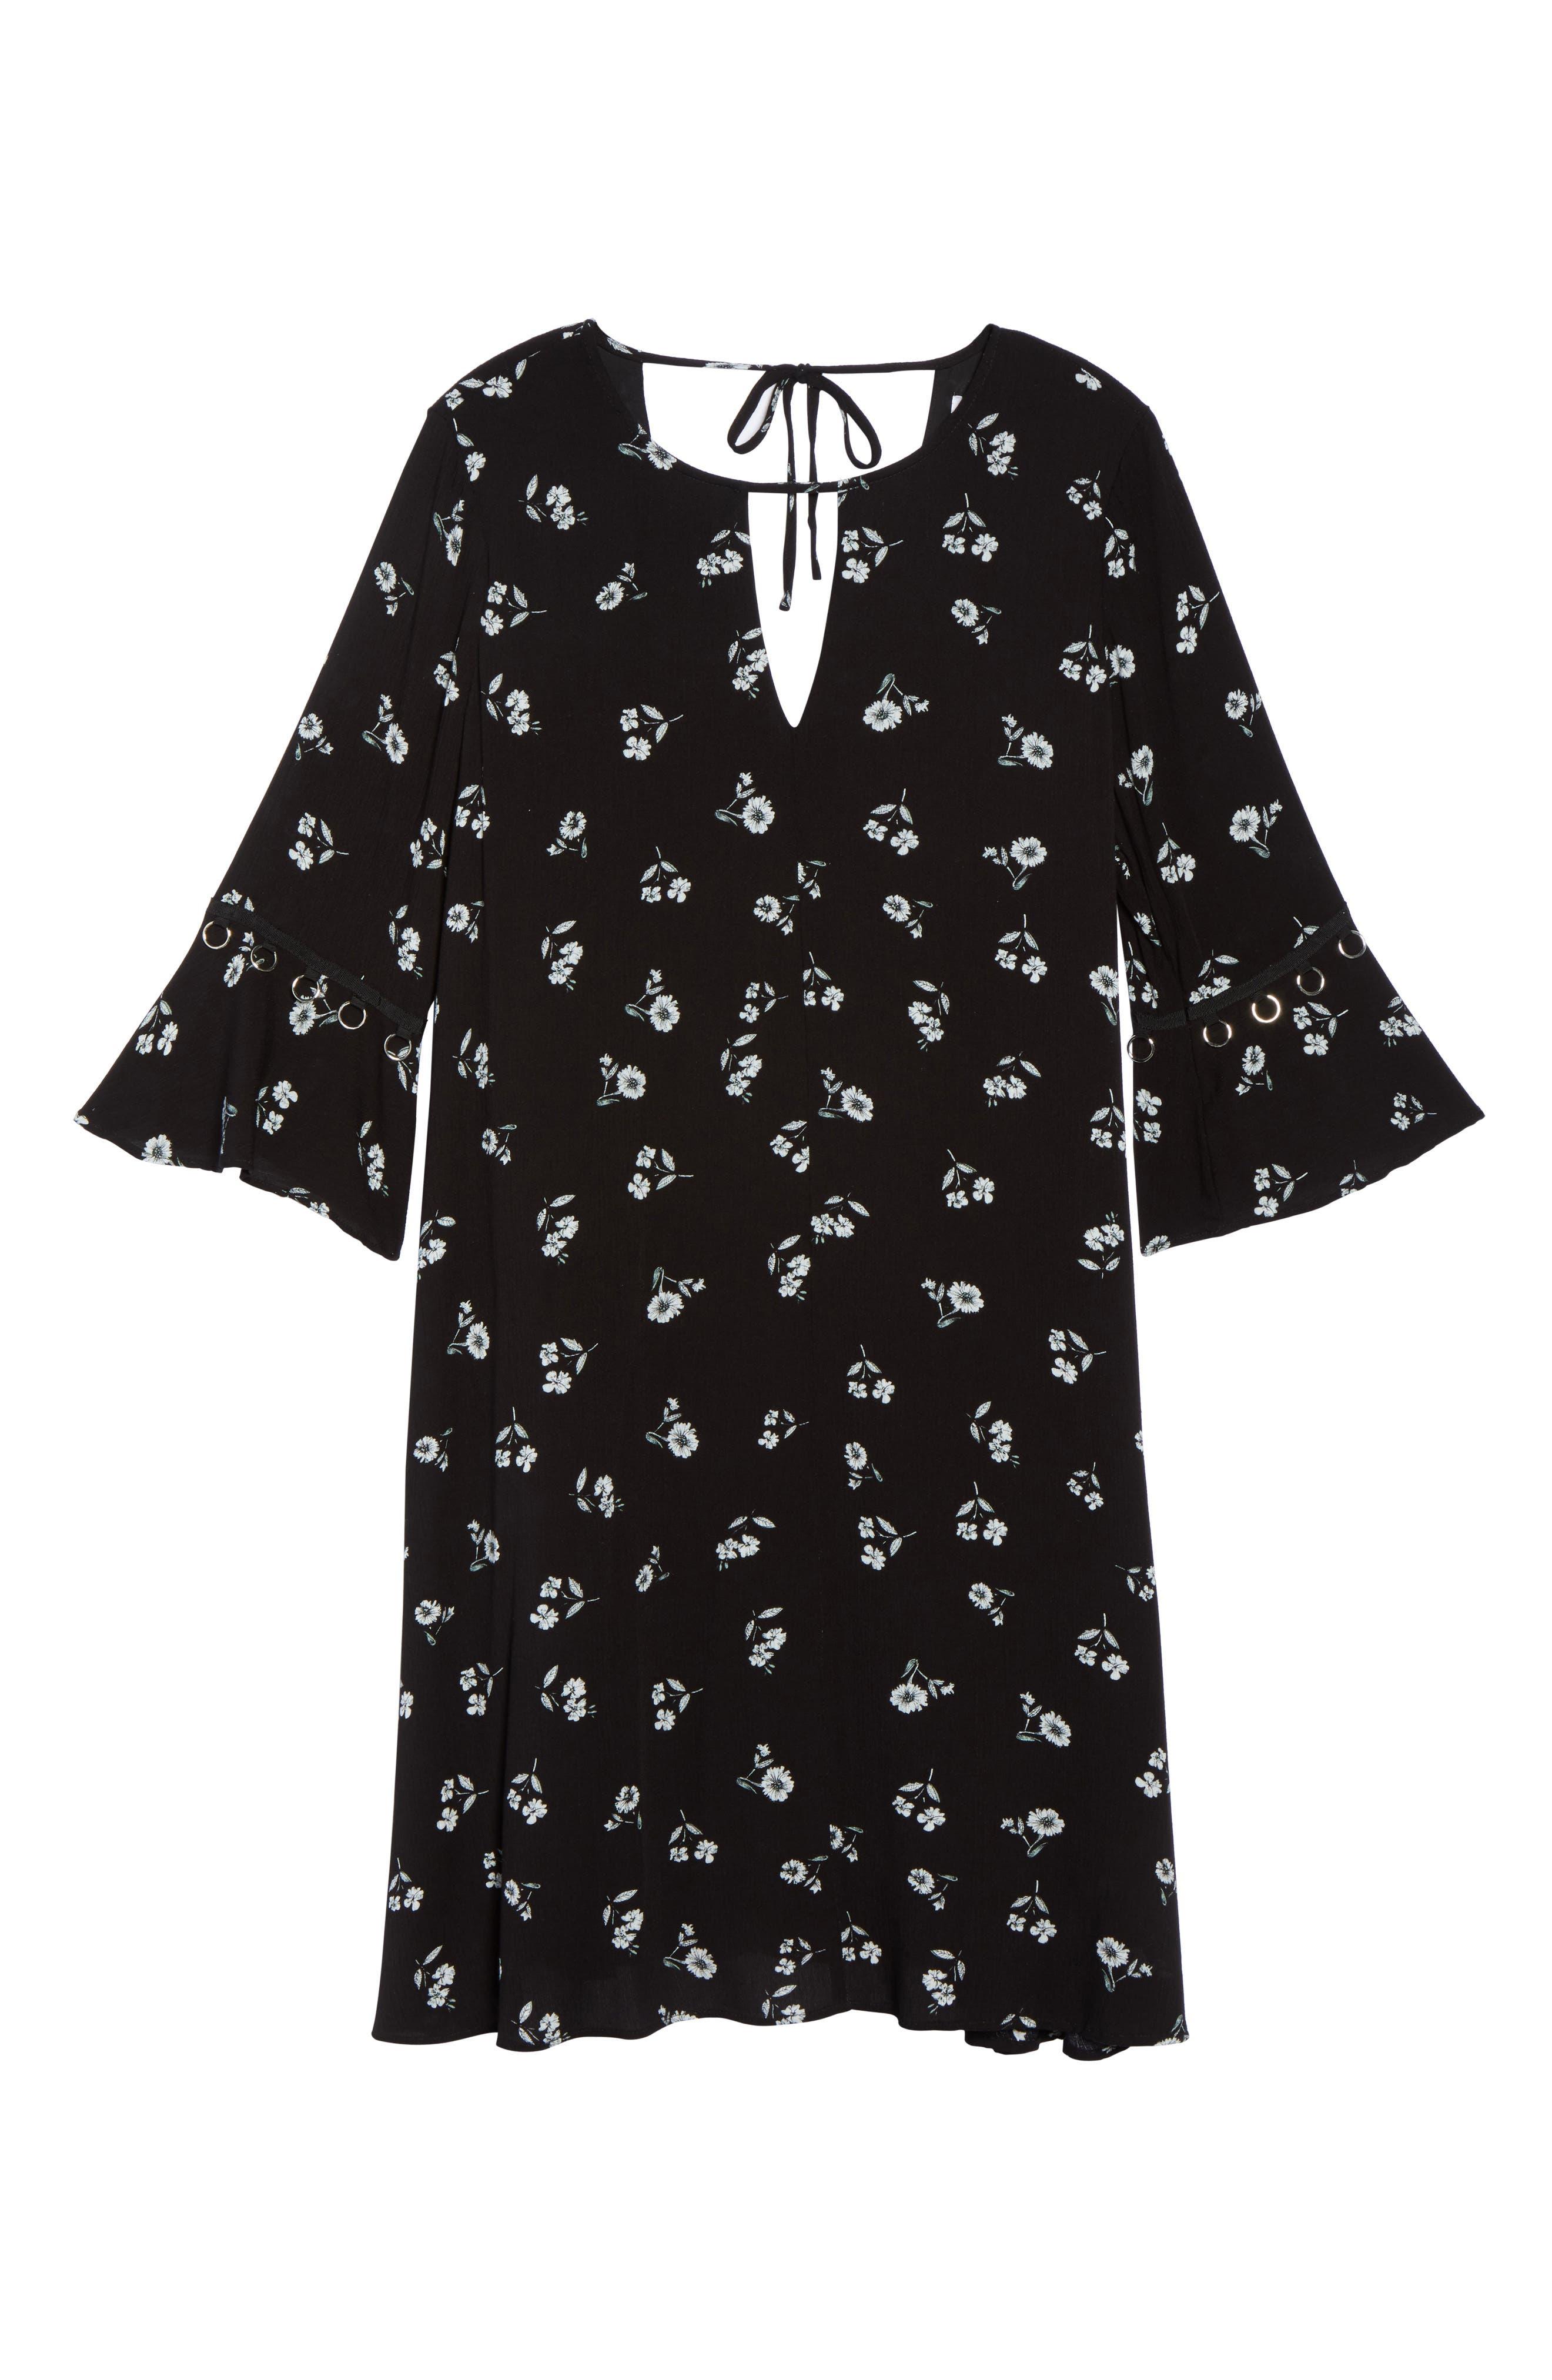 Bell Sleeve Floral Shift Dress,                             Alternate thumbnail 6, color,                             Black White Daisy